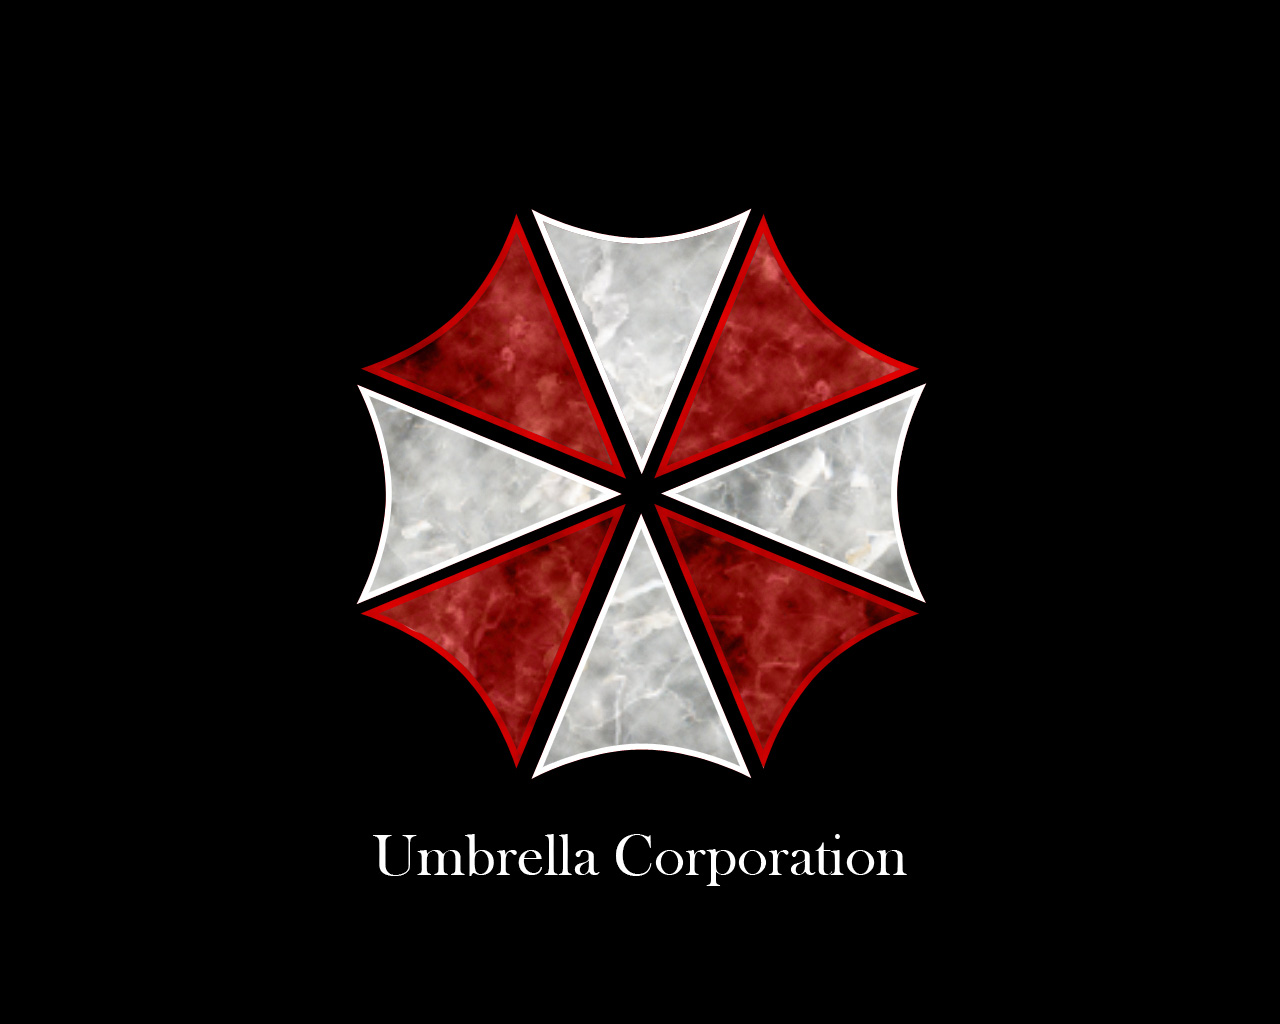 Rock it heartless!!!: Fighting Umbrella Corporation